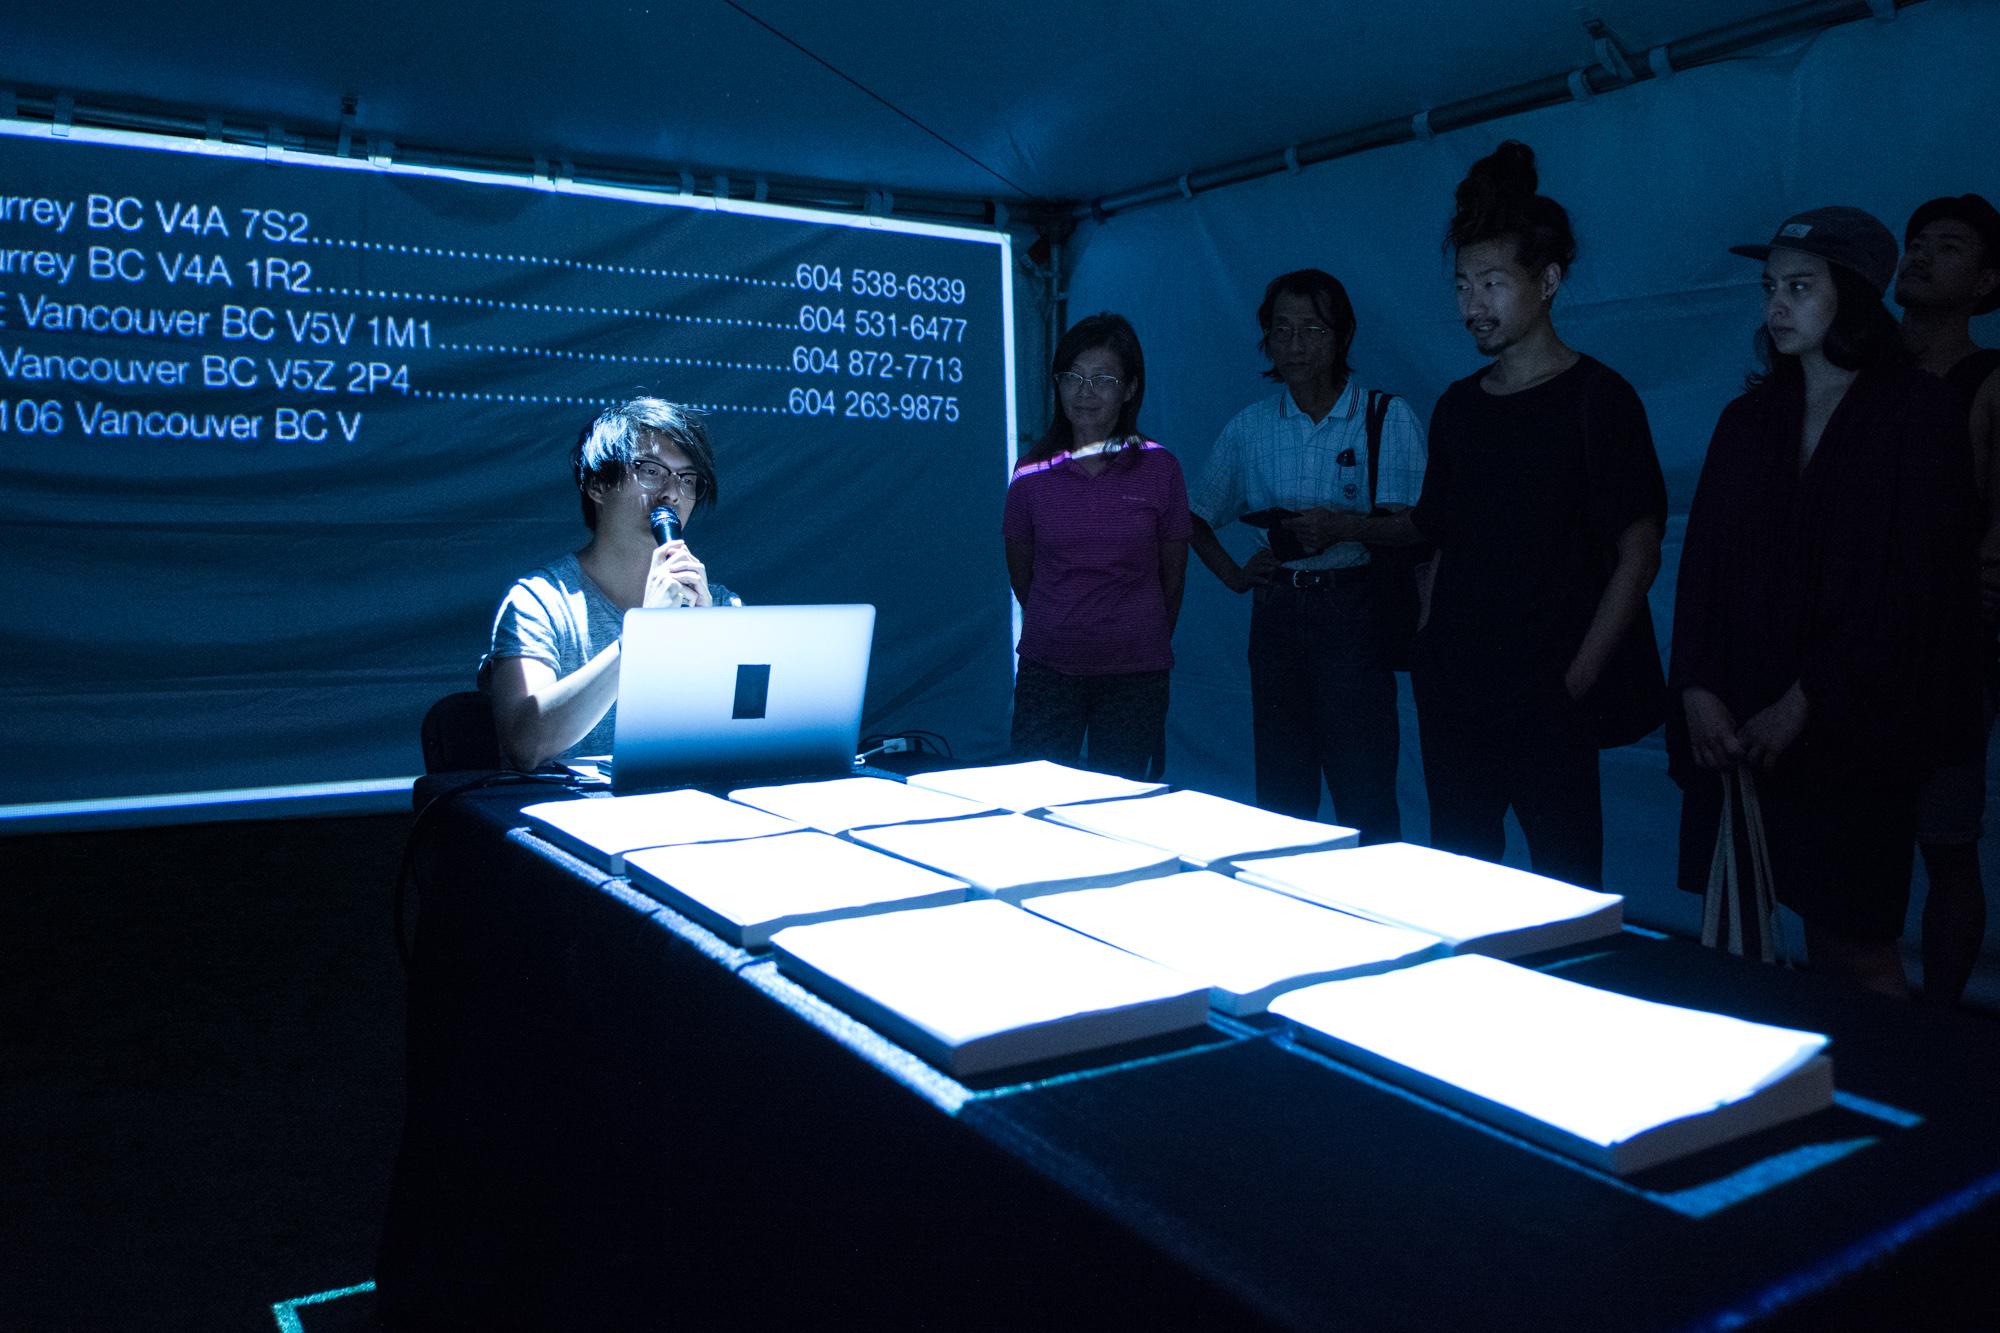 Milton Lim - whitepages, performance. Ash Tanasiychuk photo.